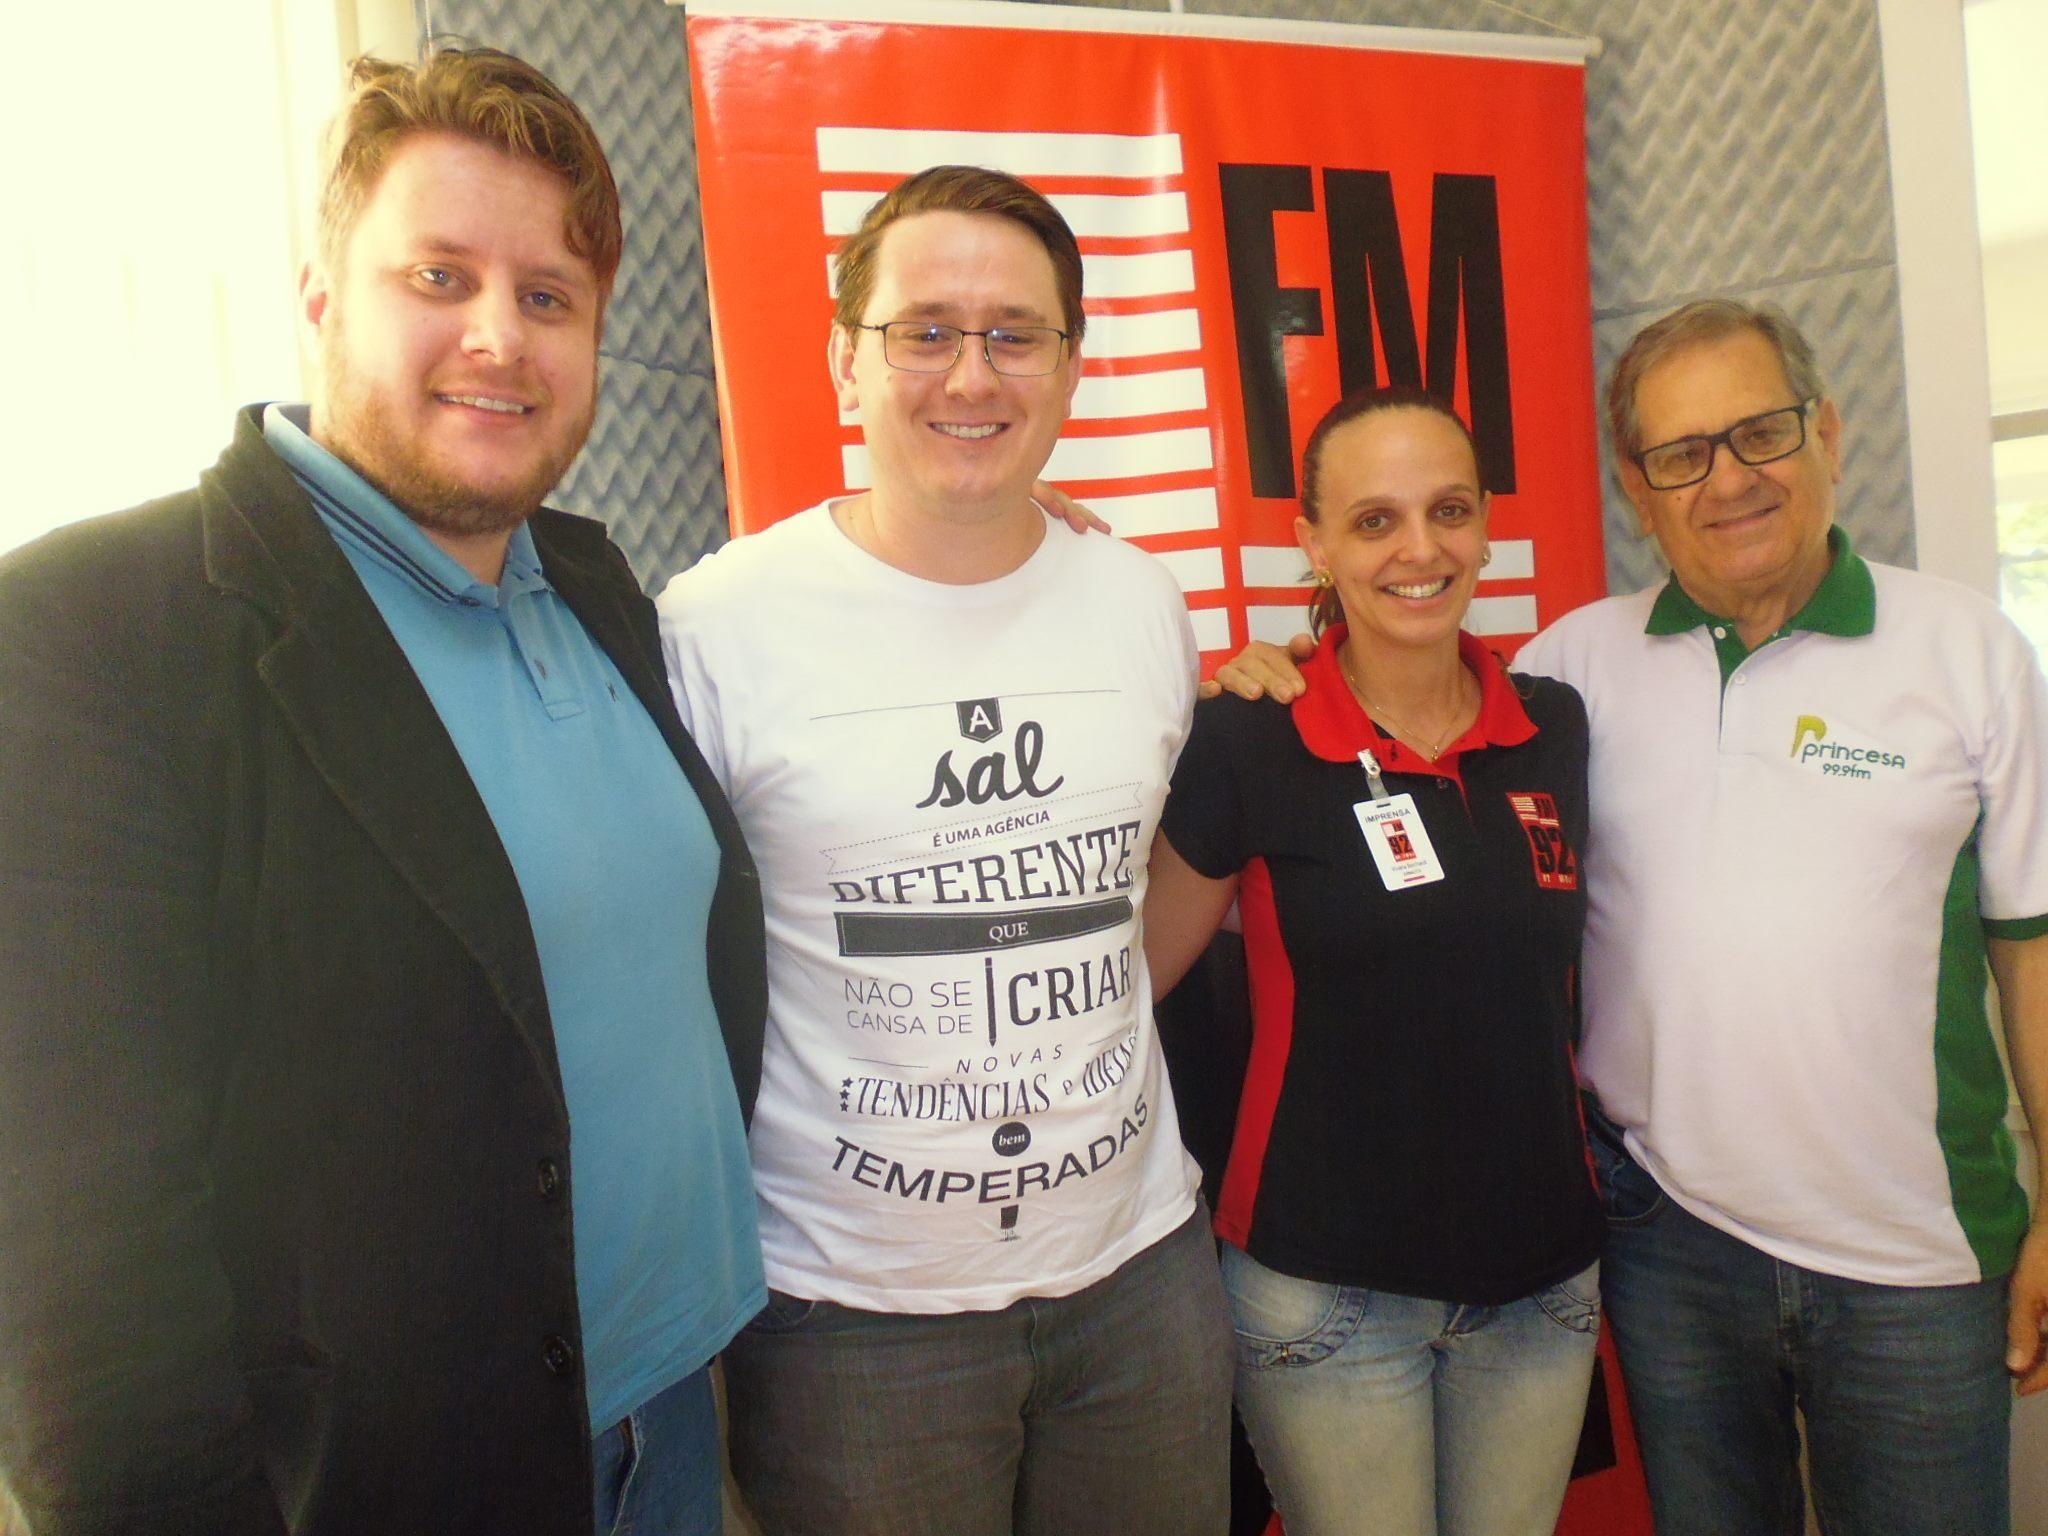 Entrevista Chamella e Sal Propaganda na Rádio 92FM